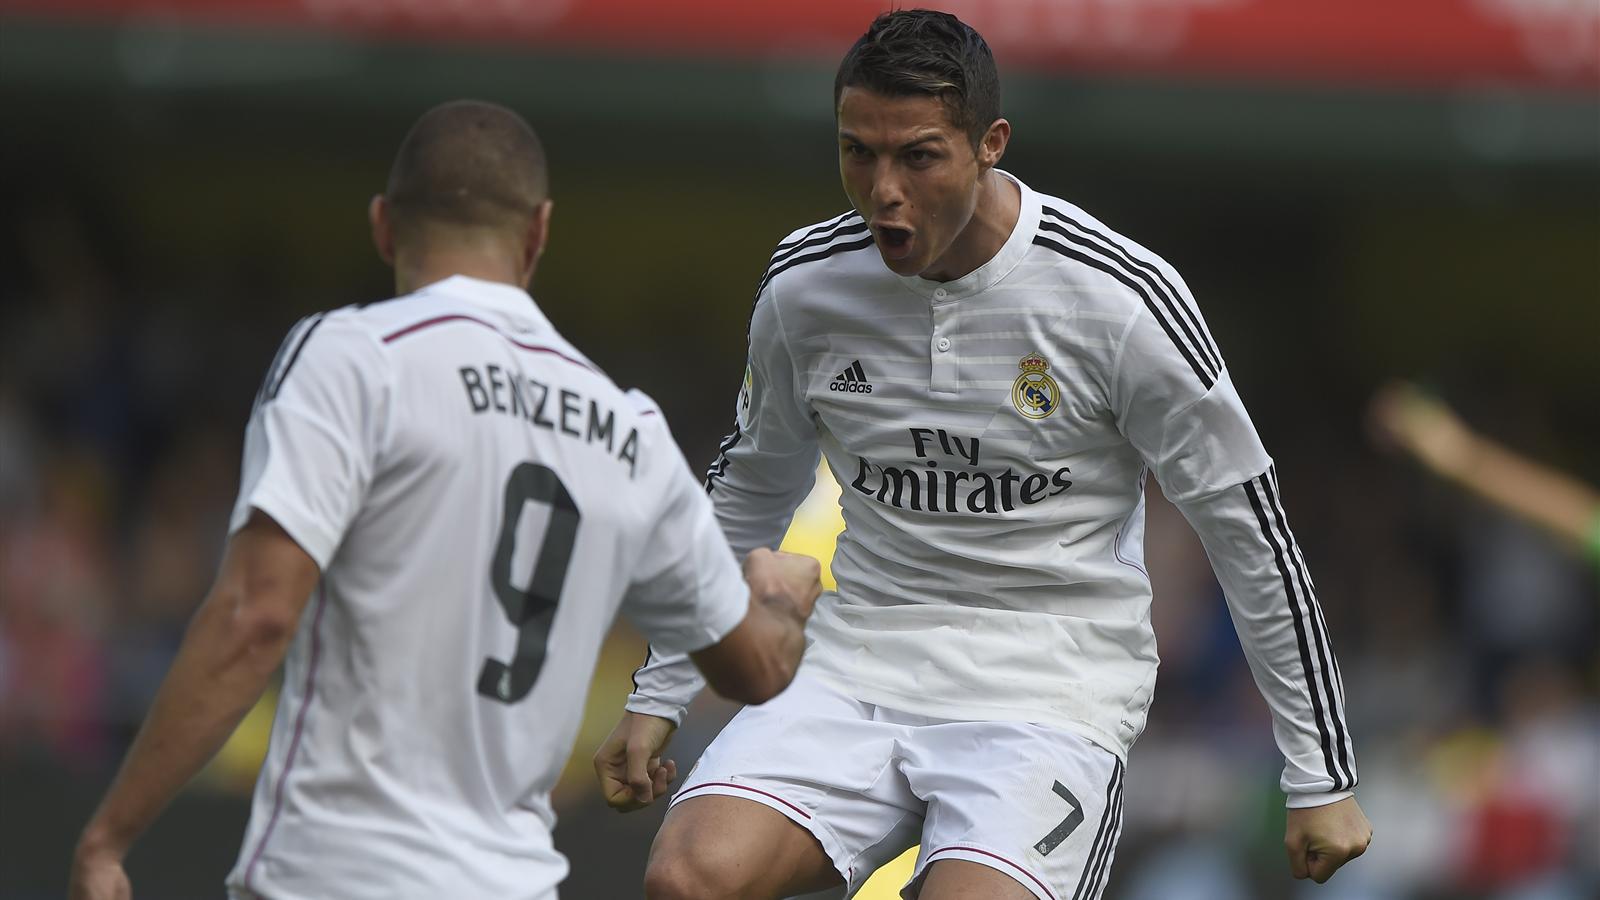 Villarreal 0-2 Real Madrid : le Real Madrid enchaîne, Cristiano Ronaldo aussi